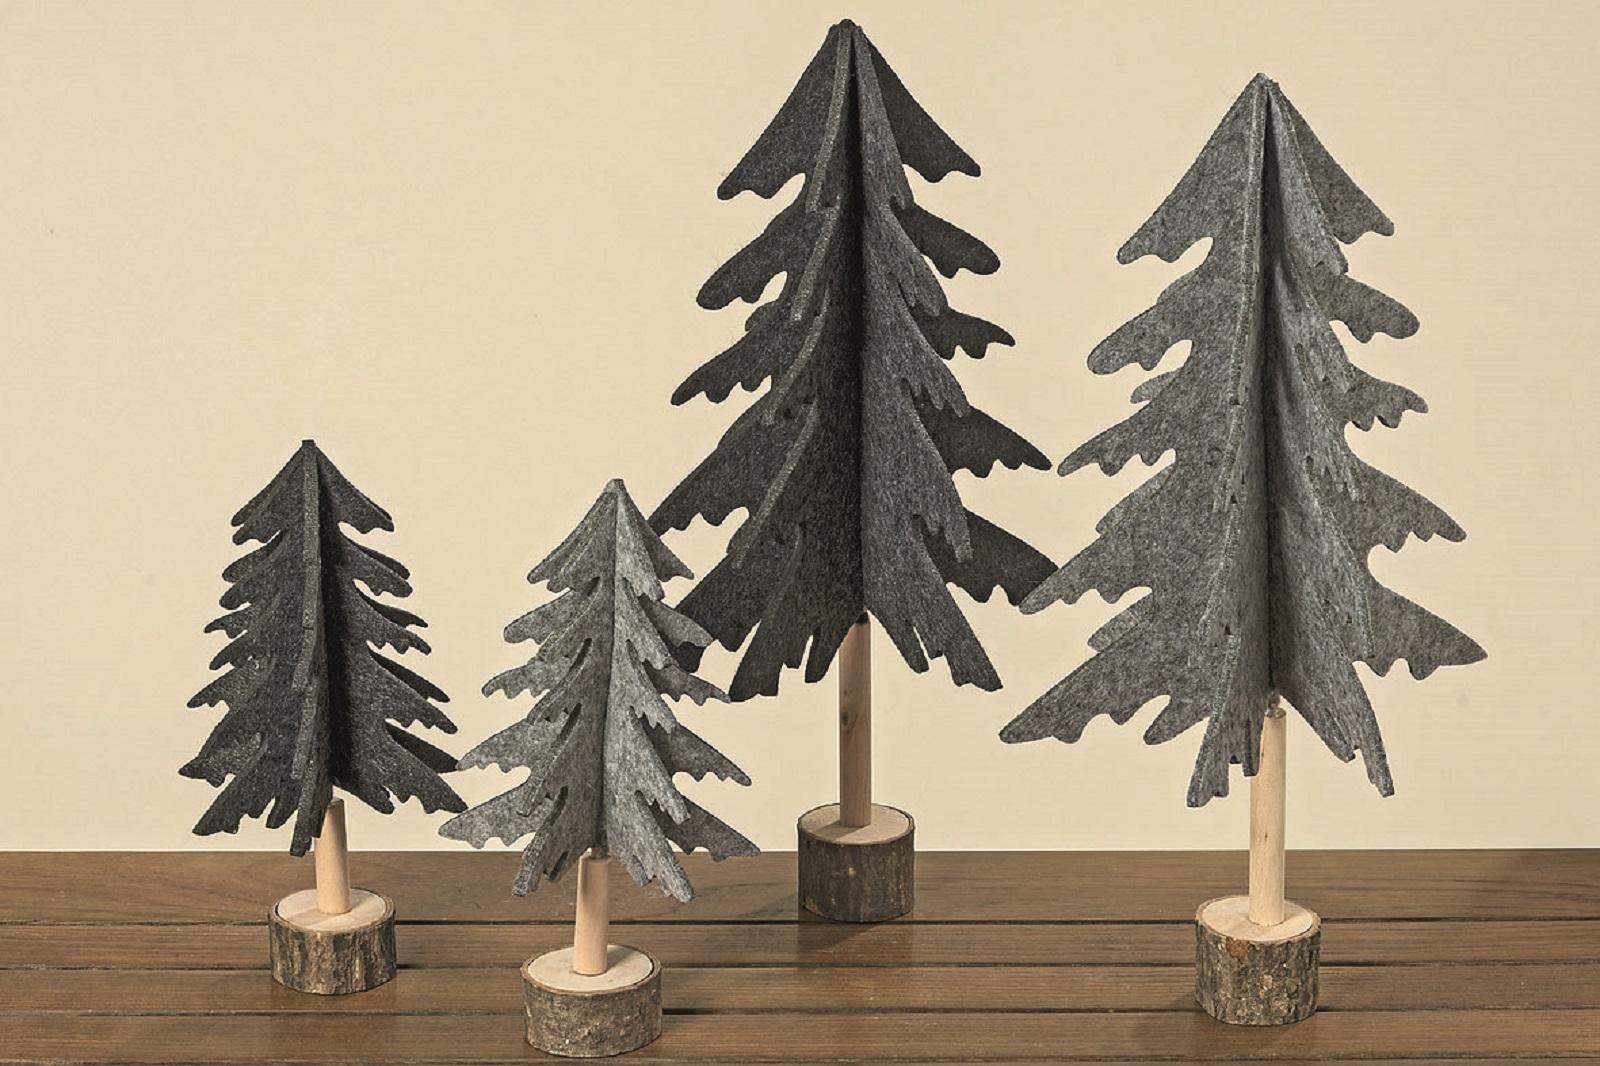 Baum Filz Dekobaum H 42 cm Stückpreis